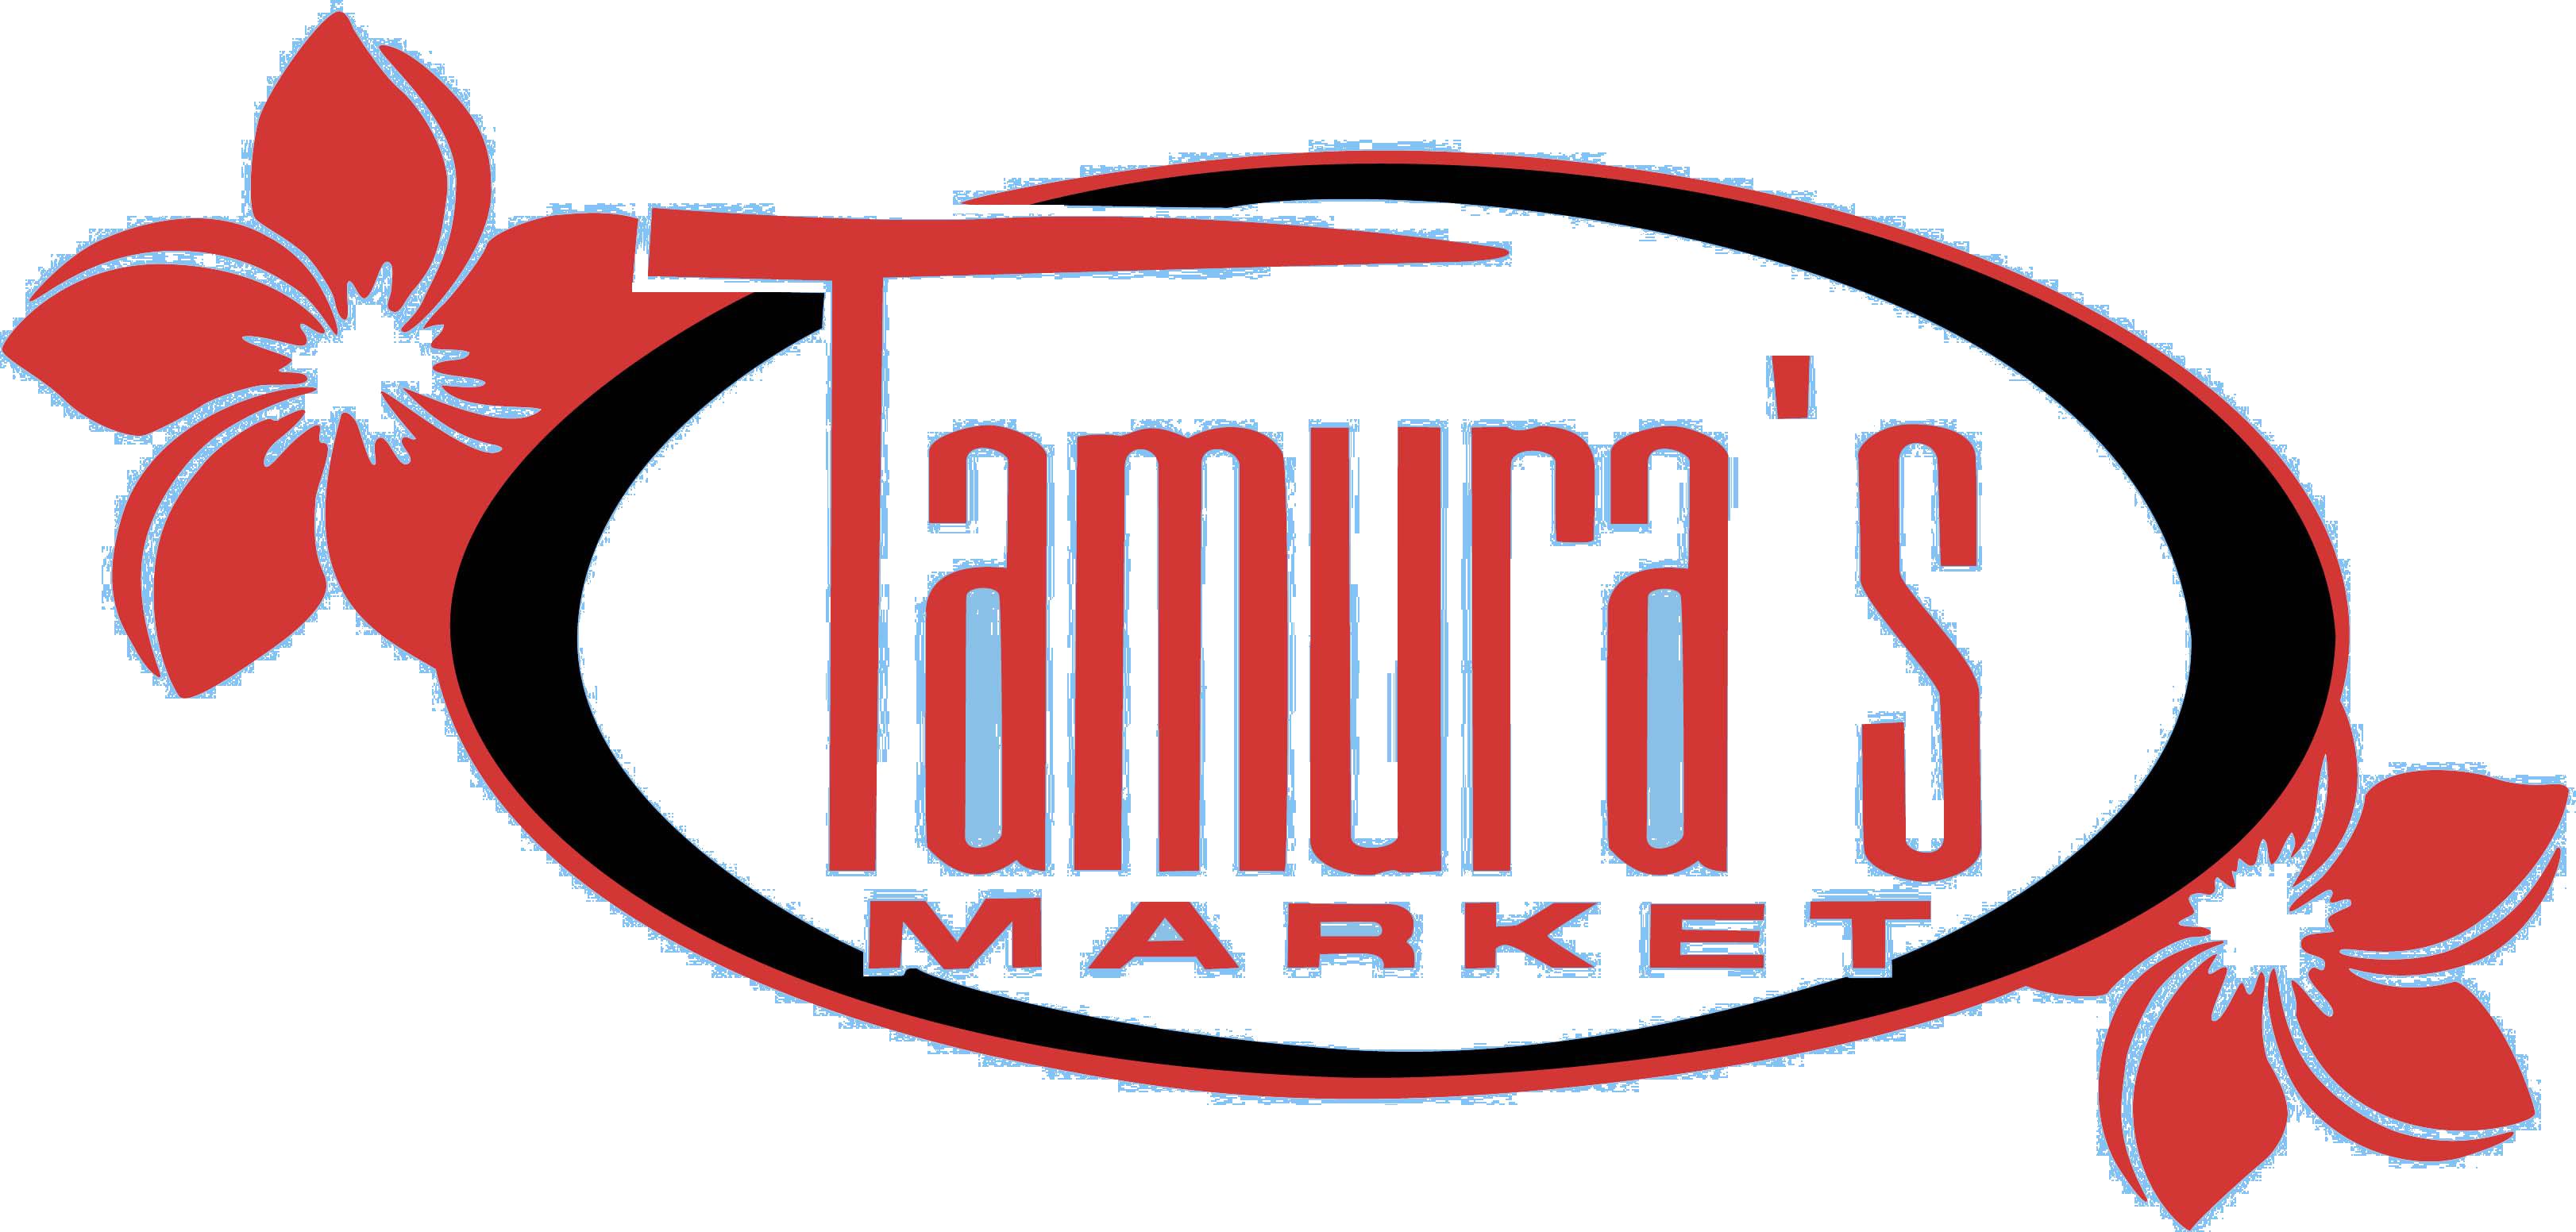 Tamura's Market.